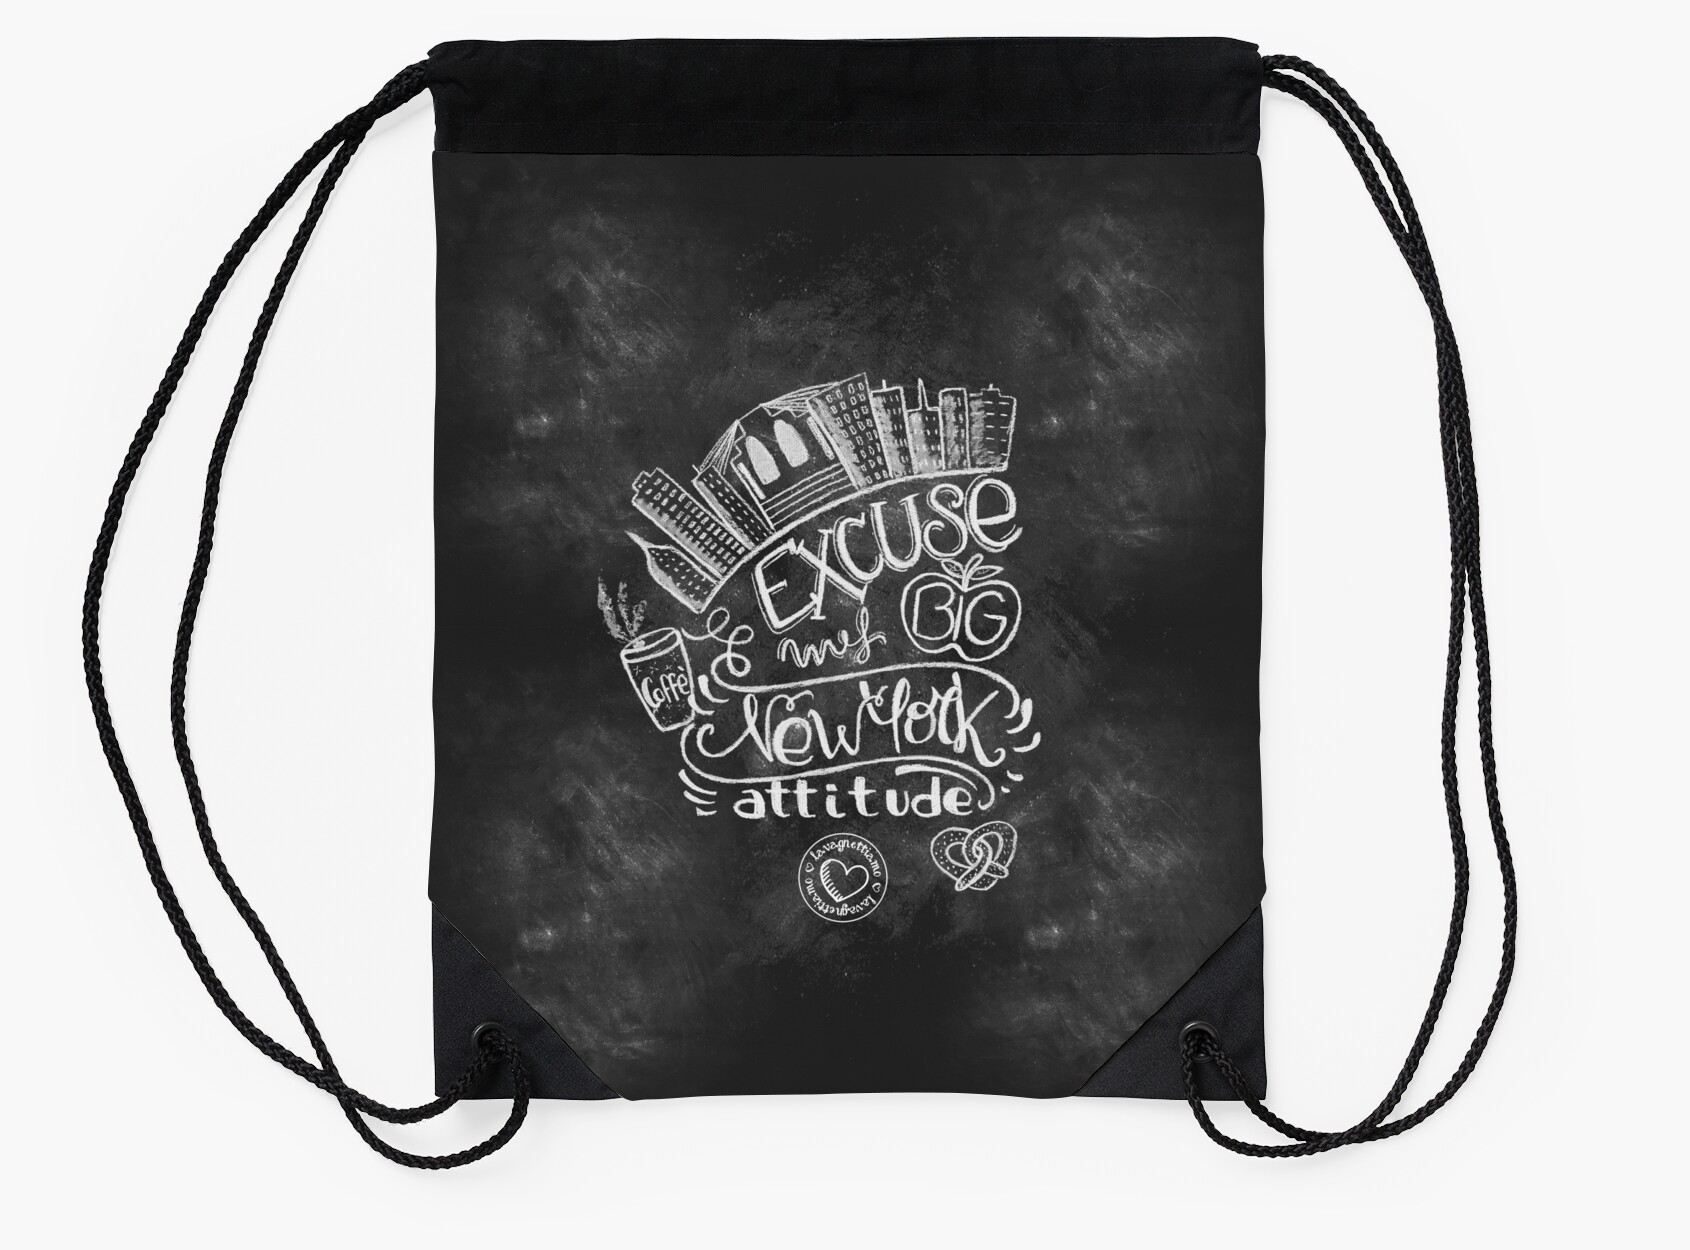 Art Bag Nyc New York Attitude Handmade Chalk Art Design Drawstring Bags By